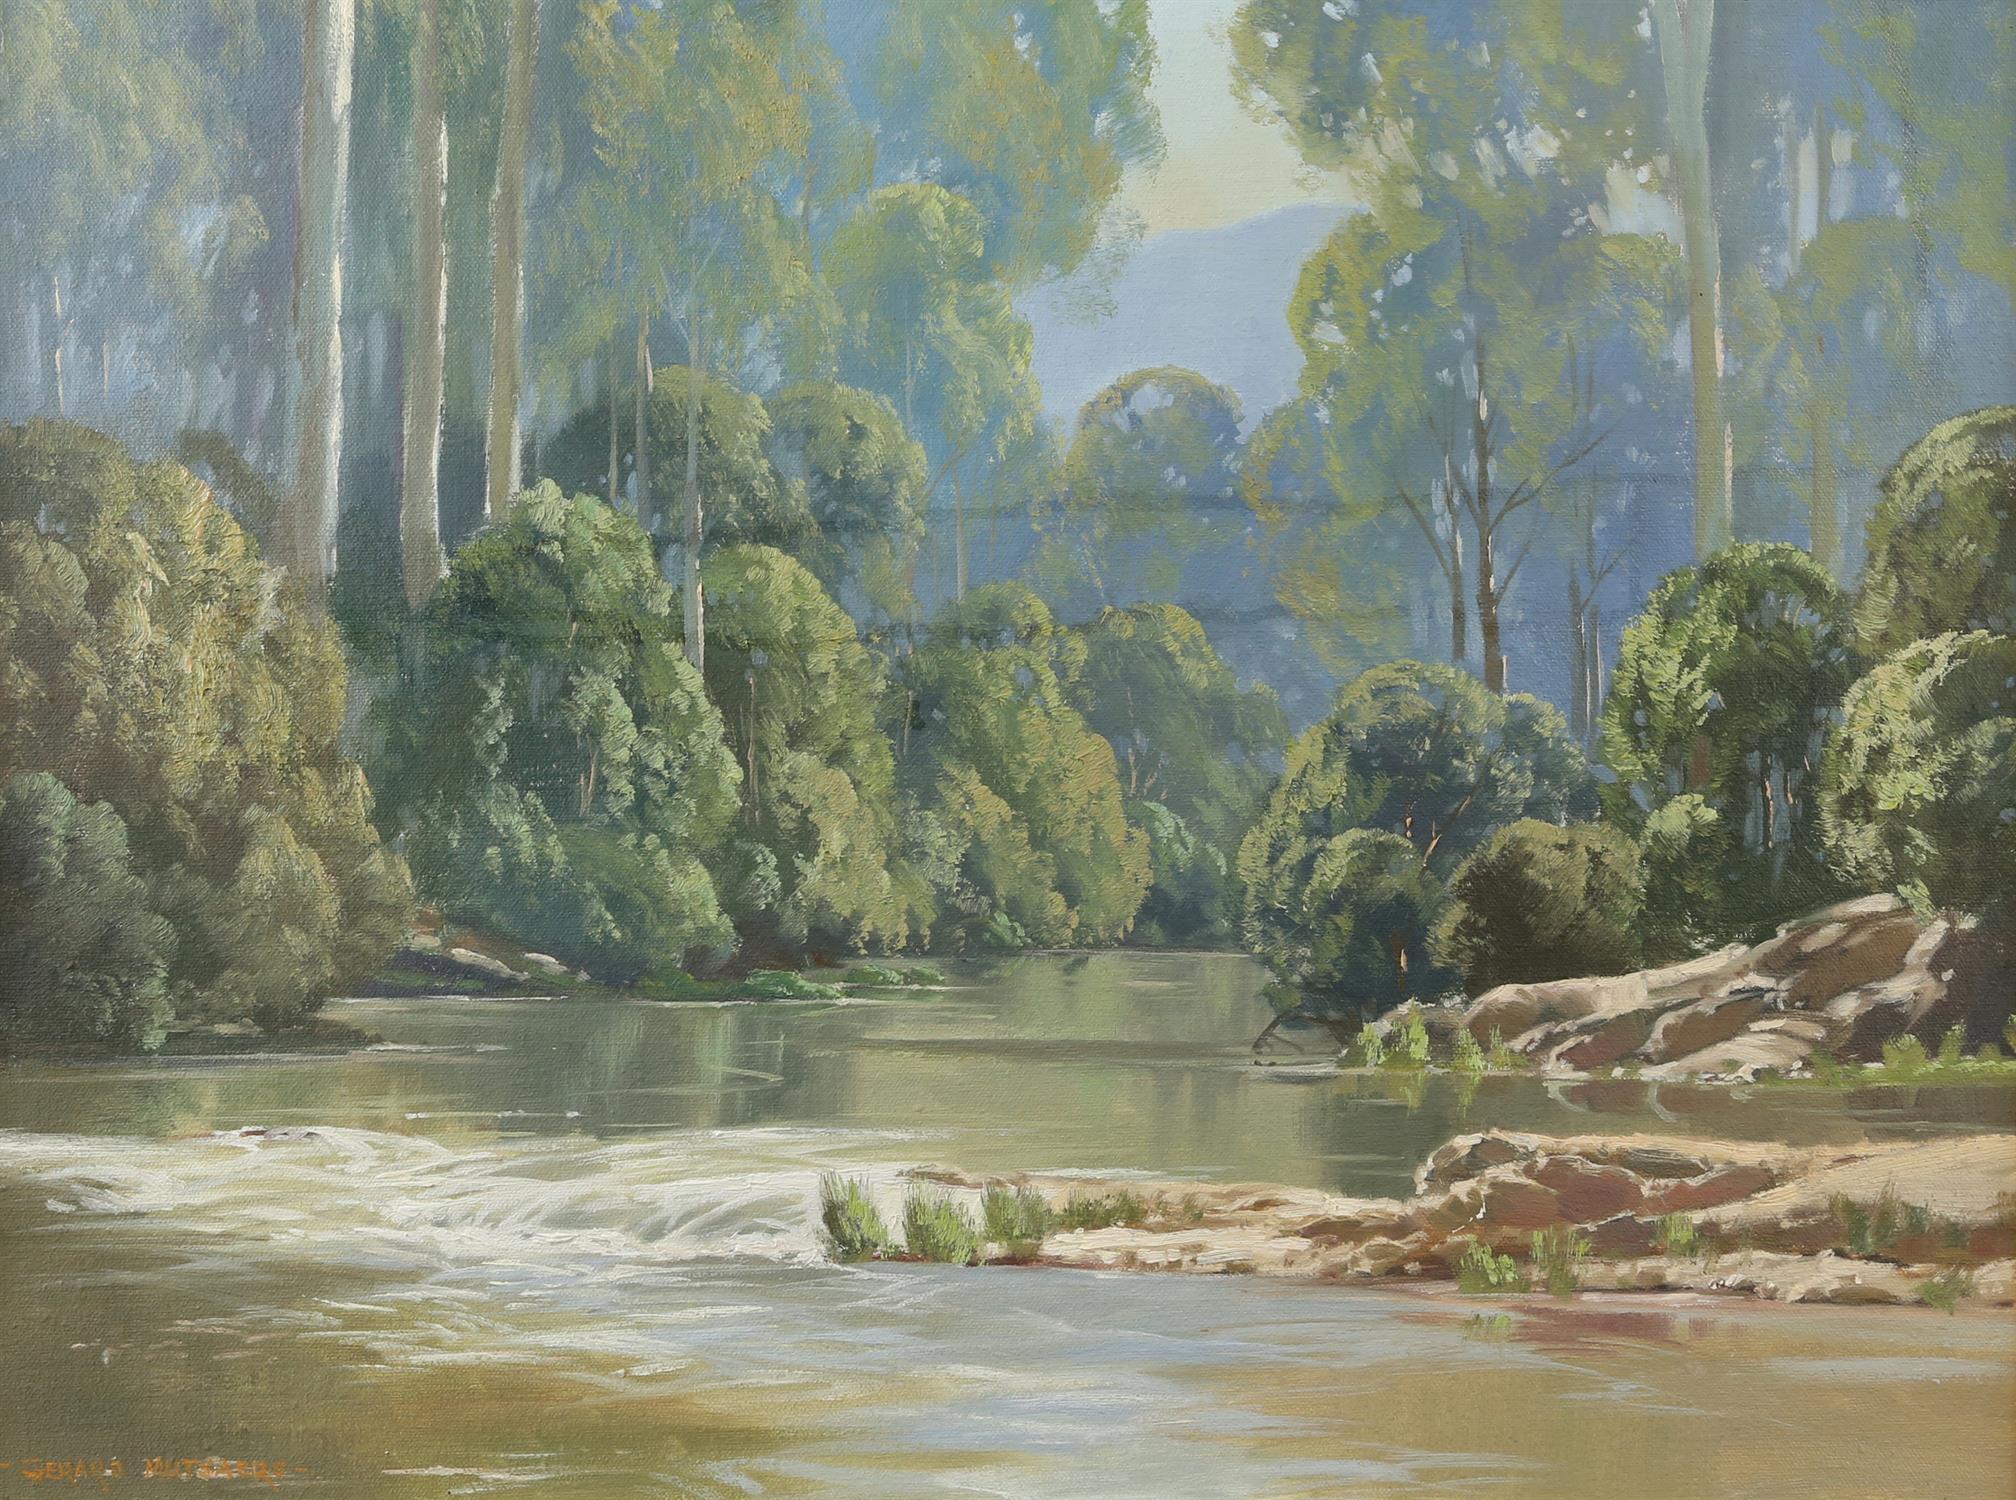 Gerard Mutsaers (Australian b. 1947), 'Morning Light, Yarra River, Warburton', signed, oil on board,